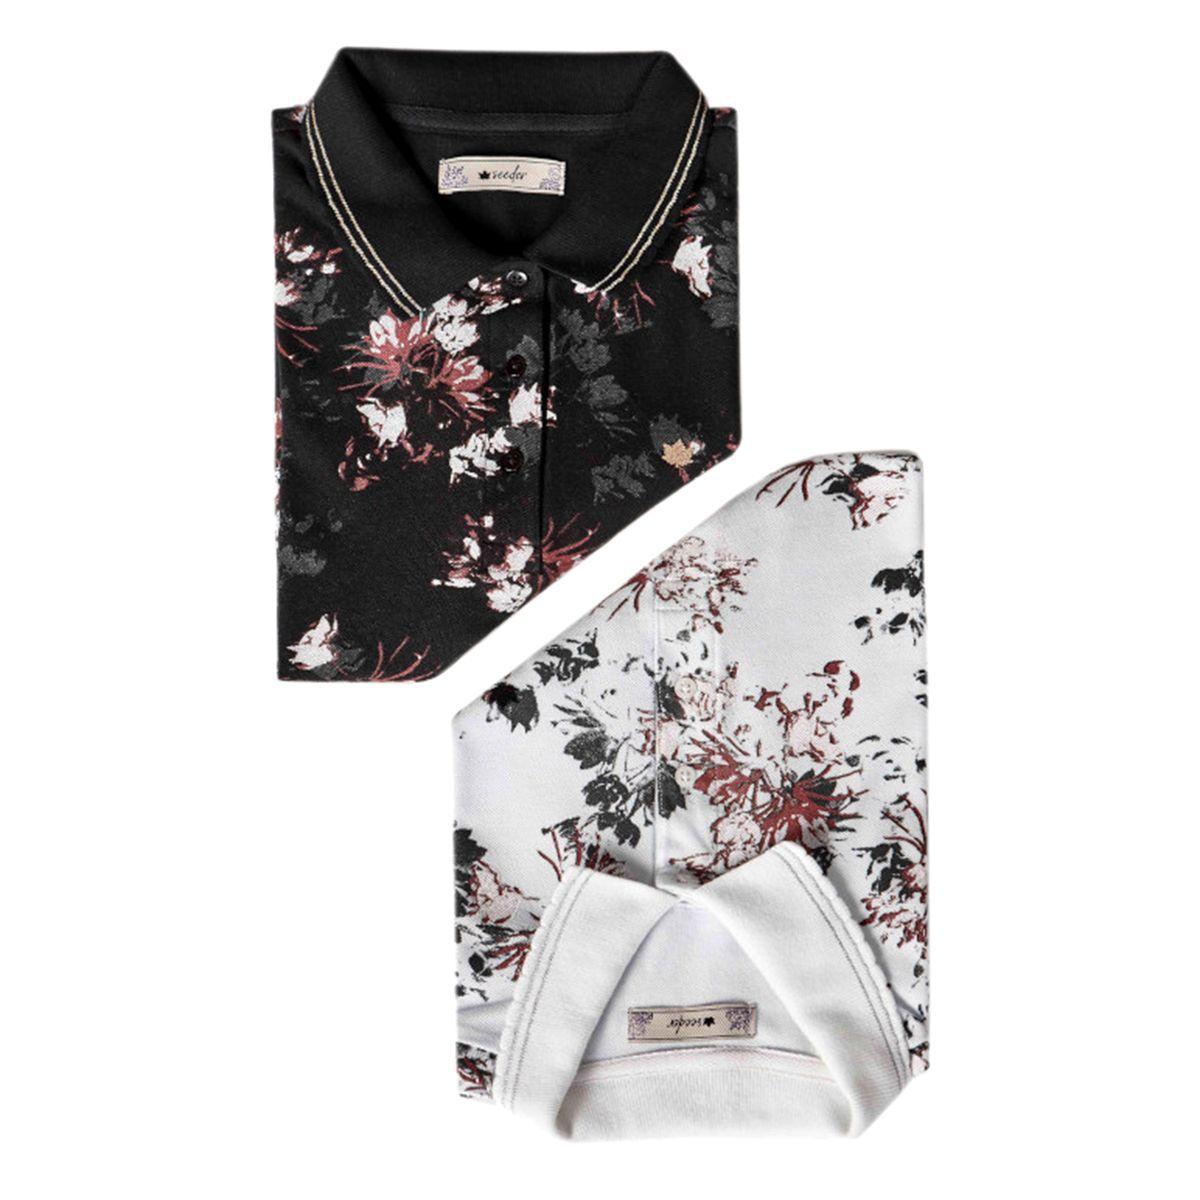 Camisa Polo Seeder Feminina Floral Branca